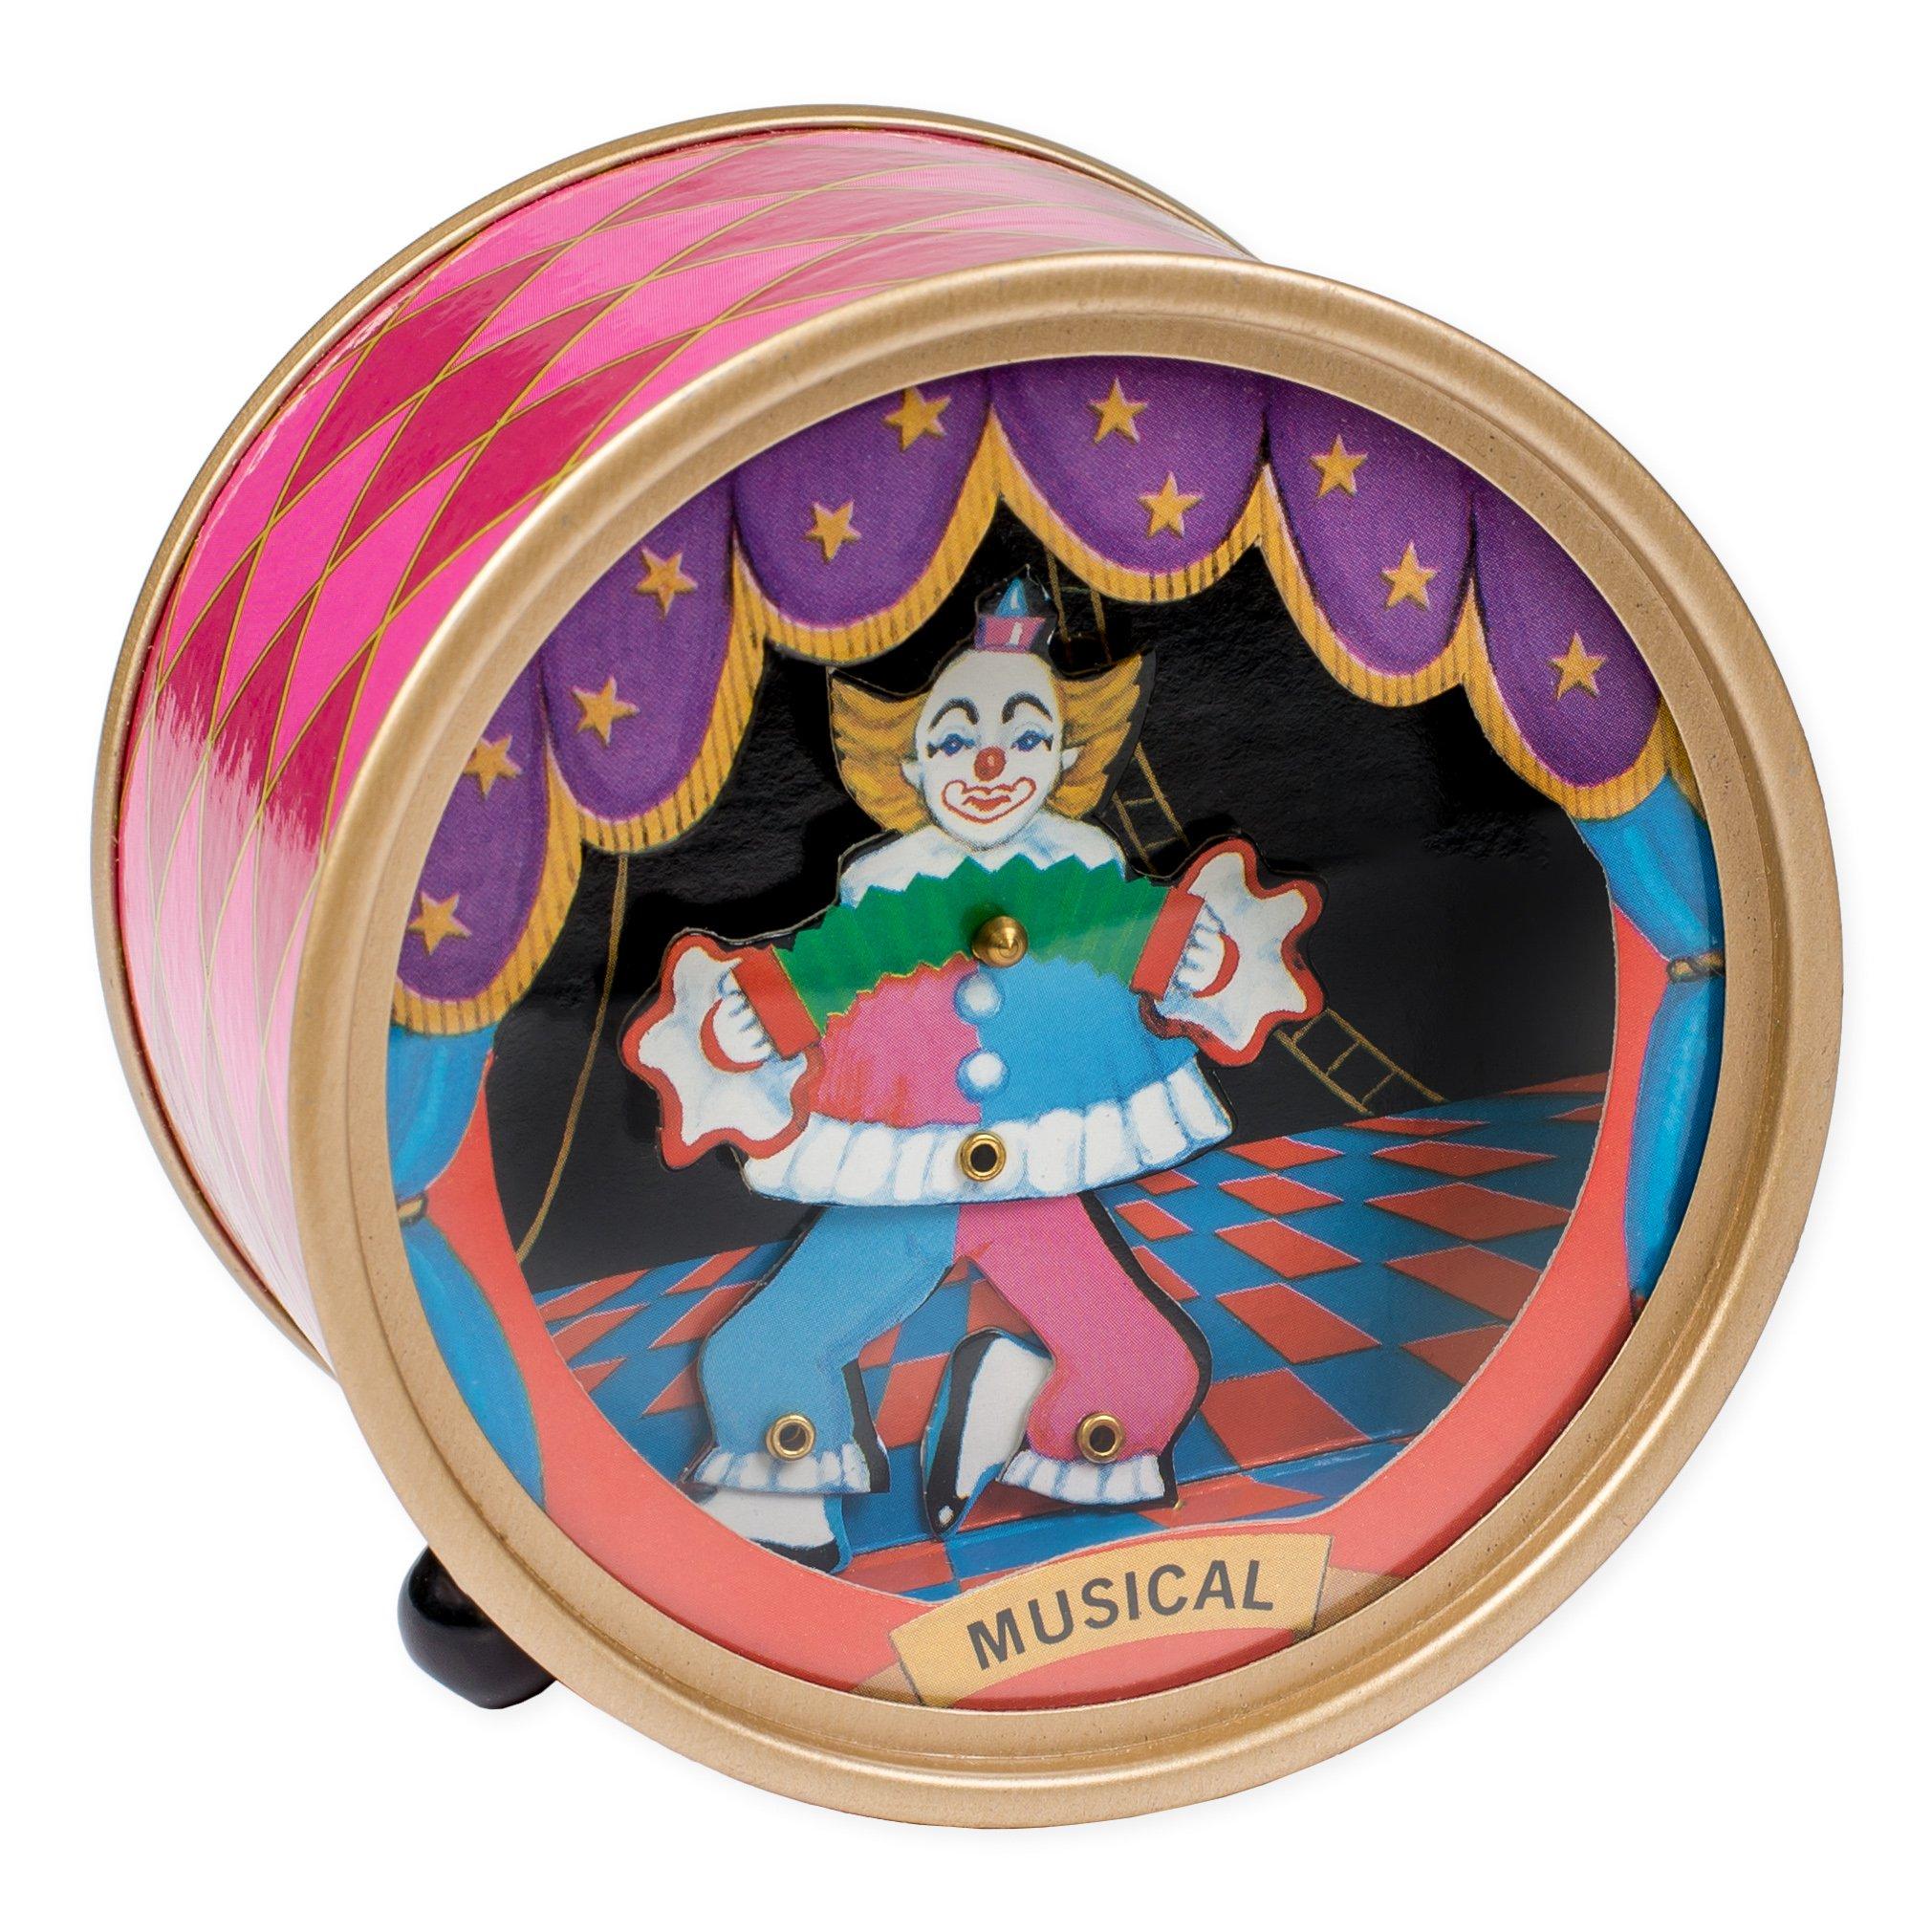 Dancing Circus Clown Pink Argyle Drum Hardboard Musical Figurine Plays Tune Send In the Clowns